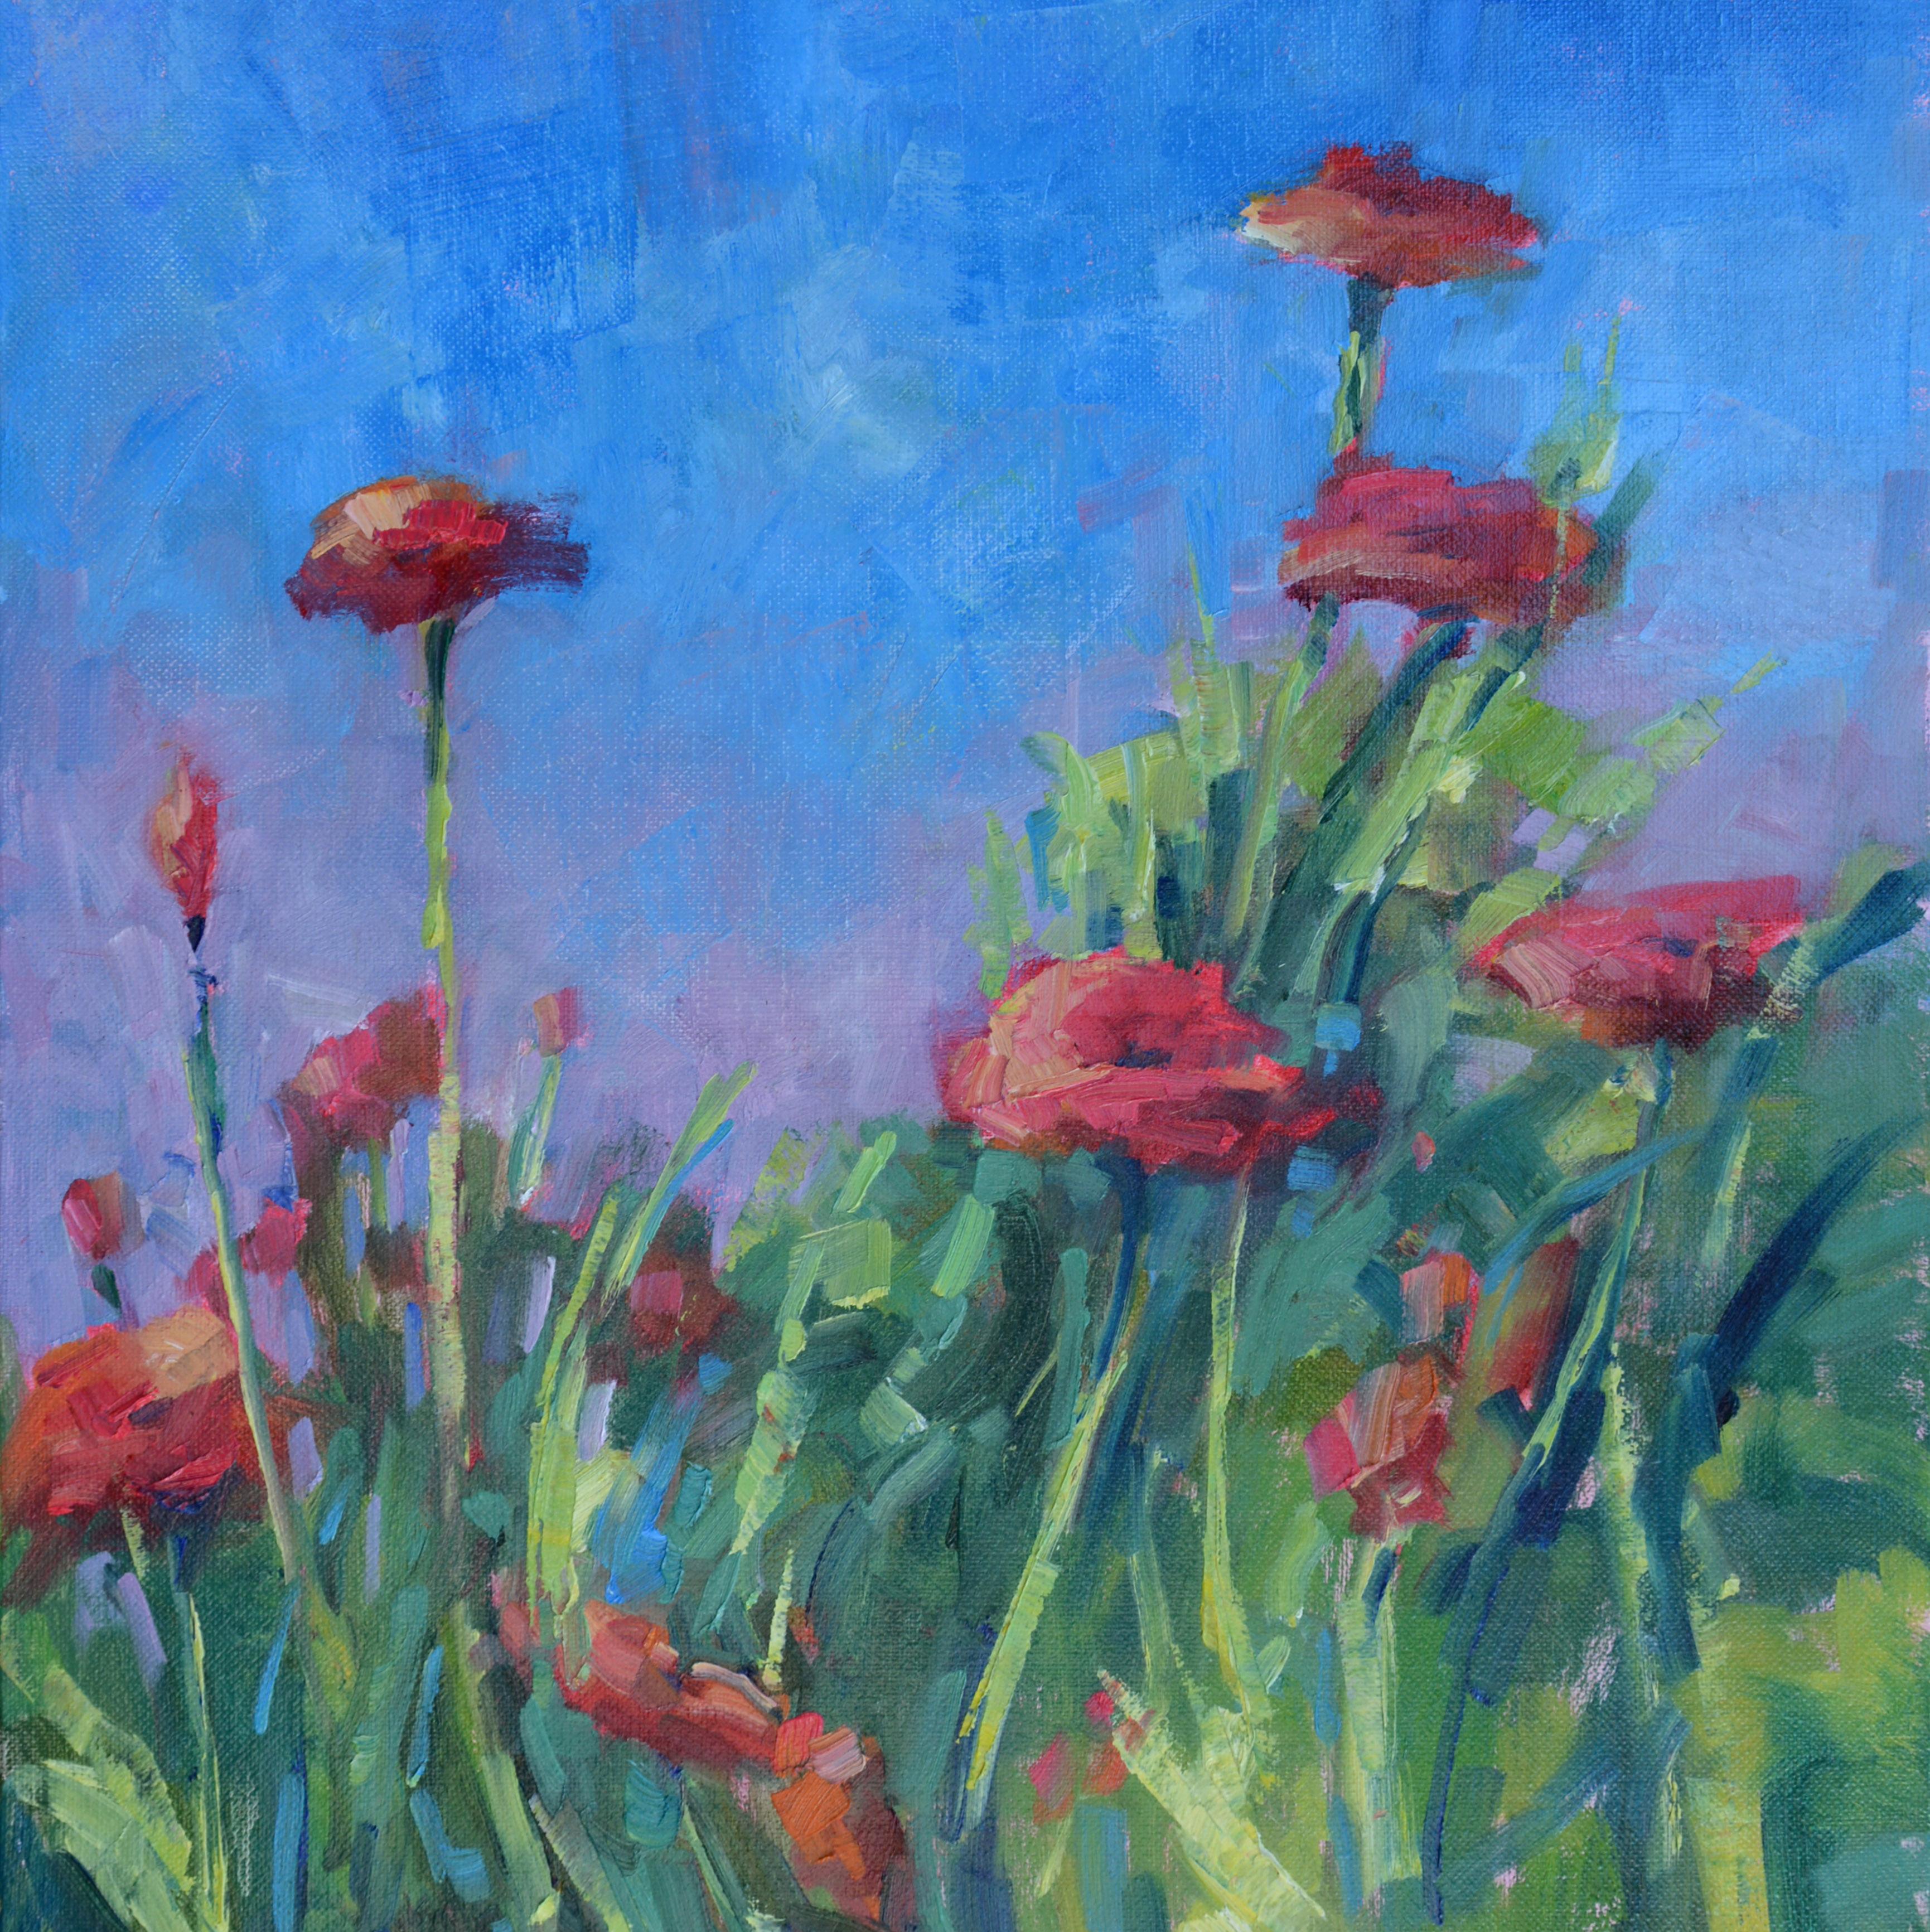 Blue Sky Poppies by Karen Hewitt Hagan